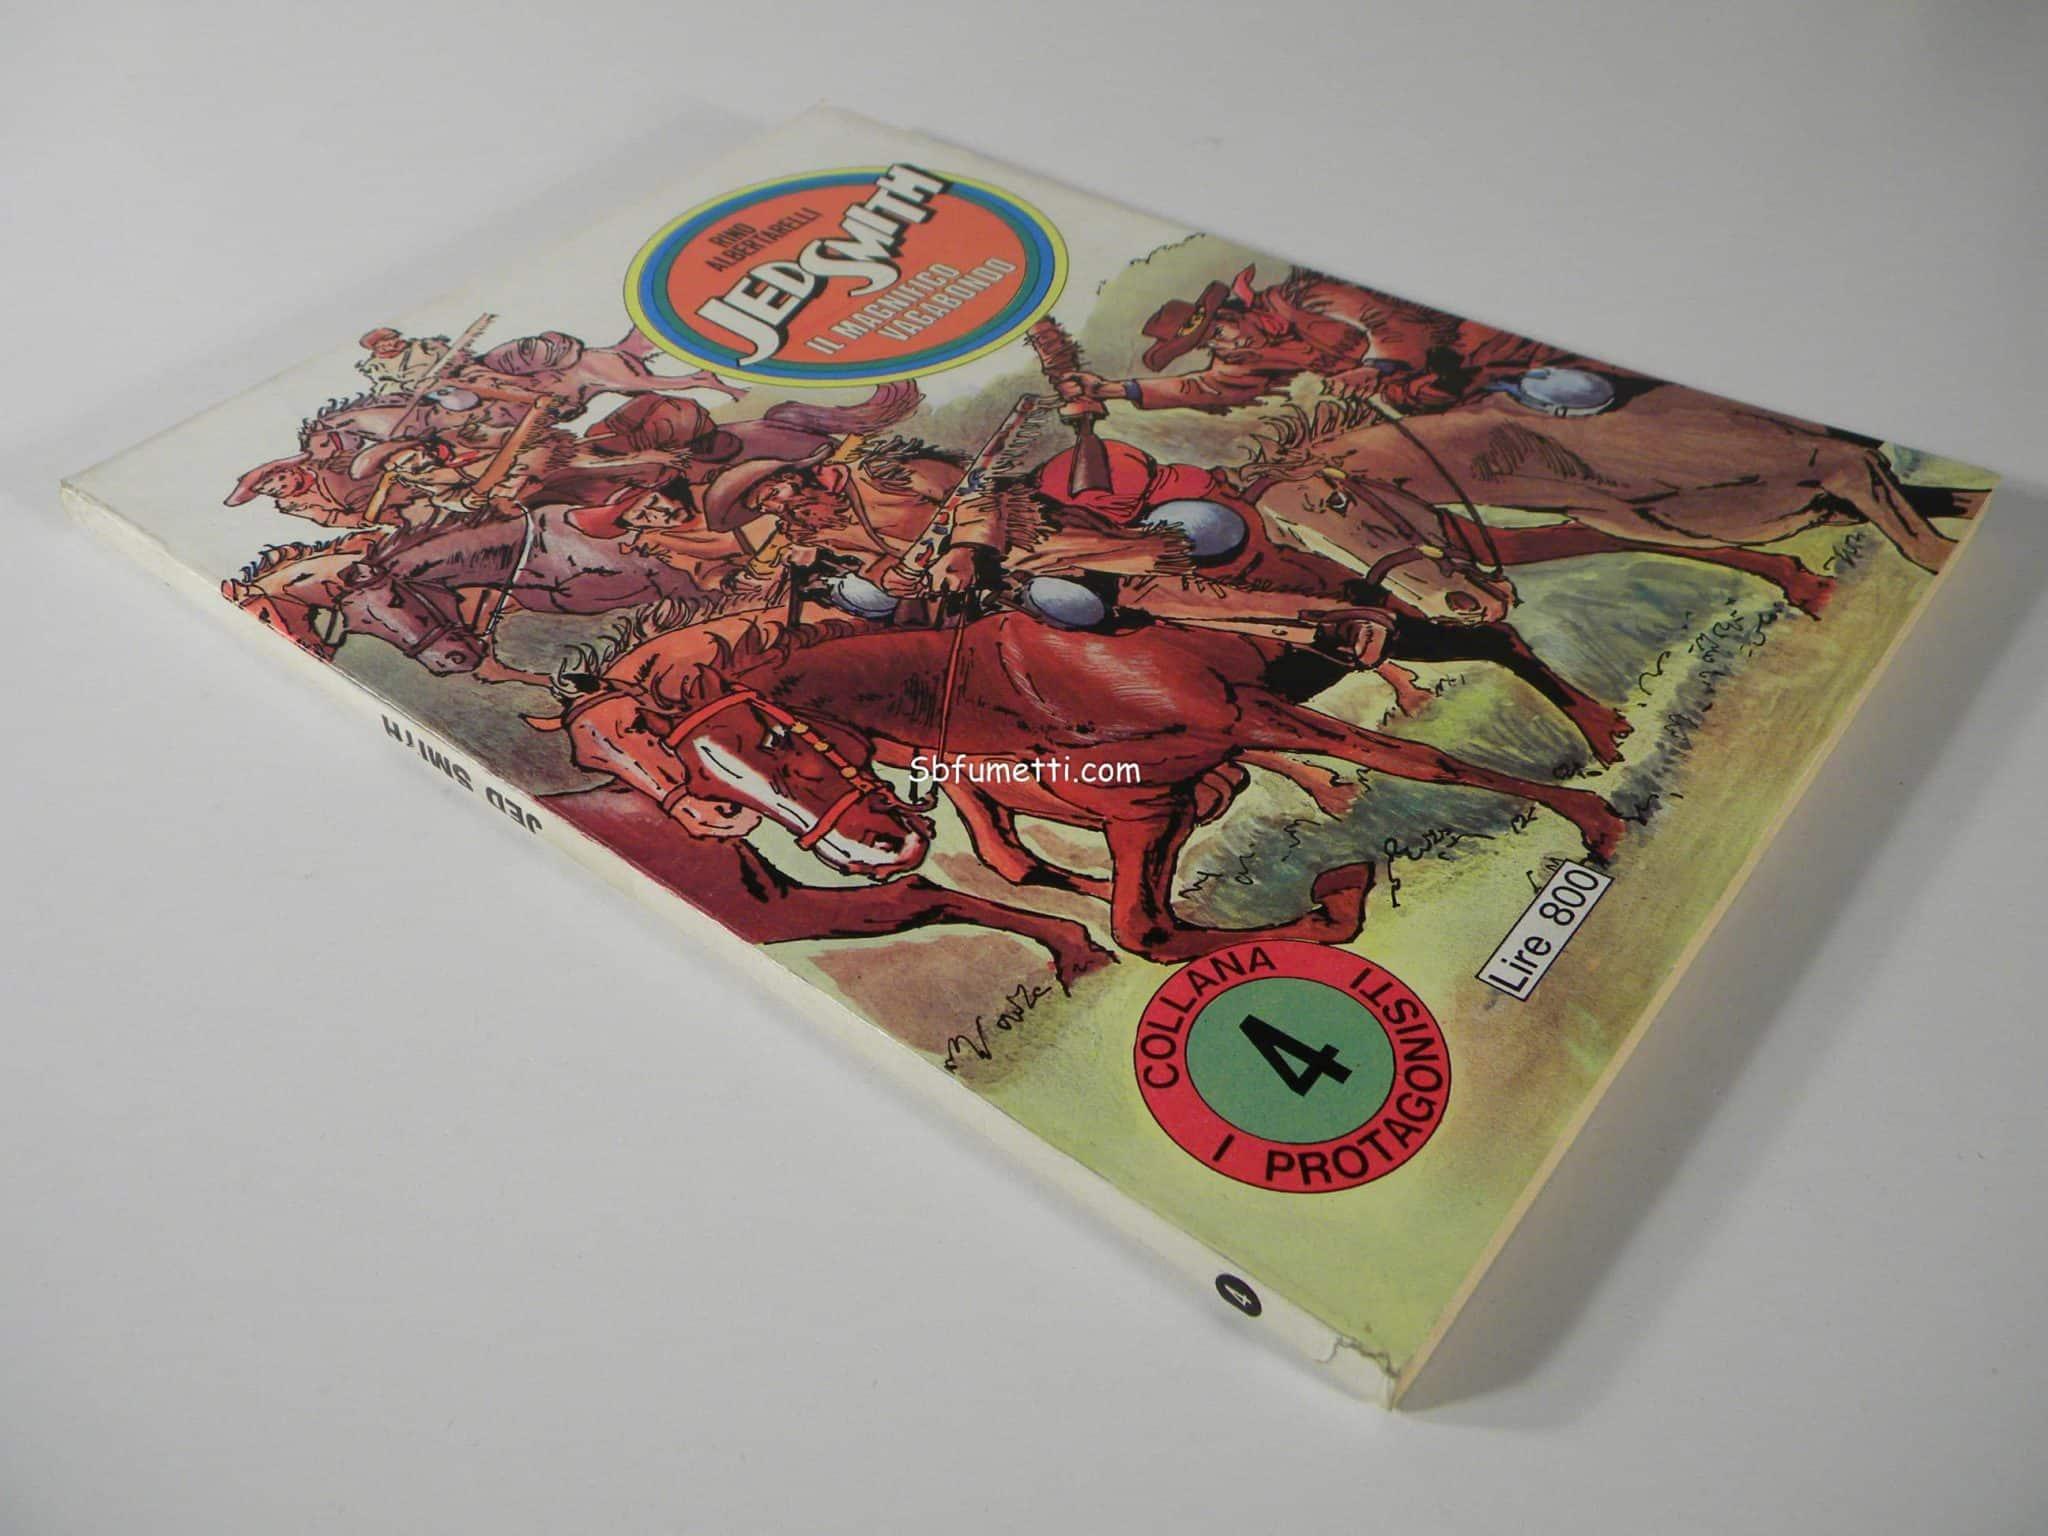 Collana Protagonisti n. 4 Daim Press